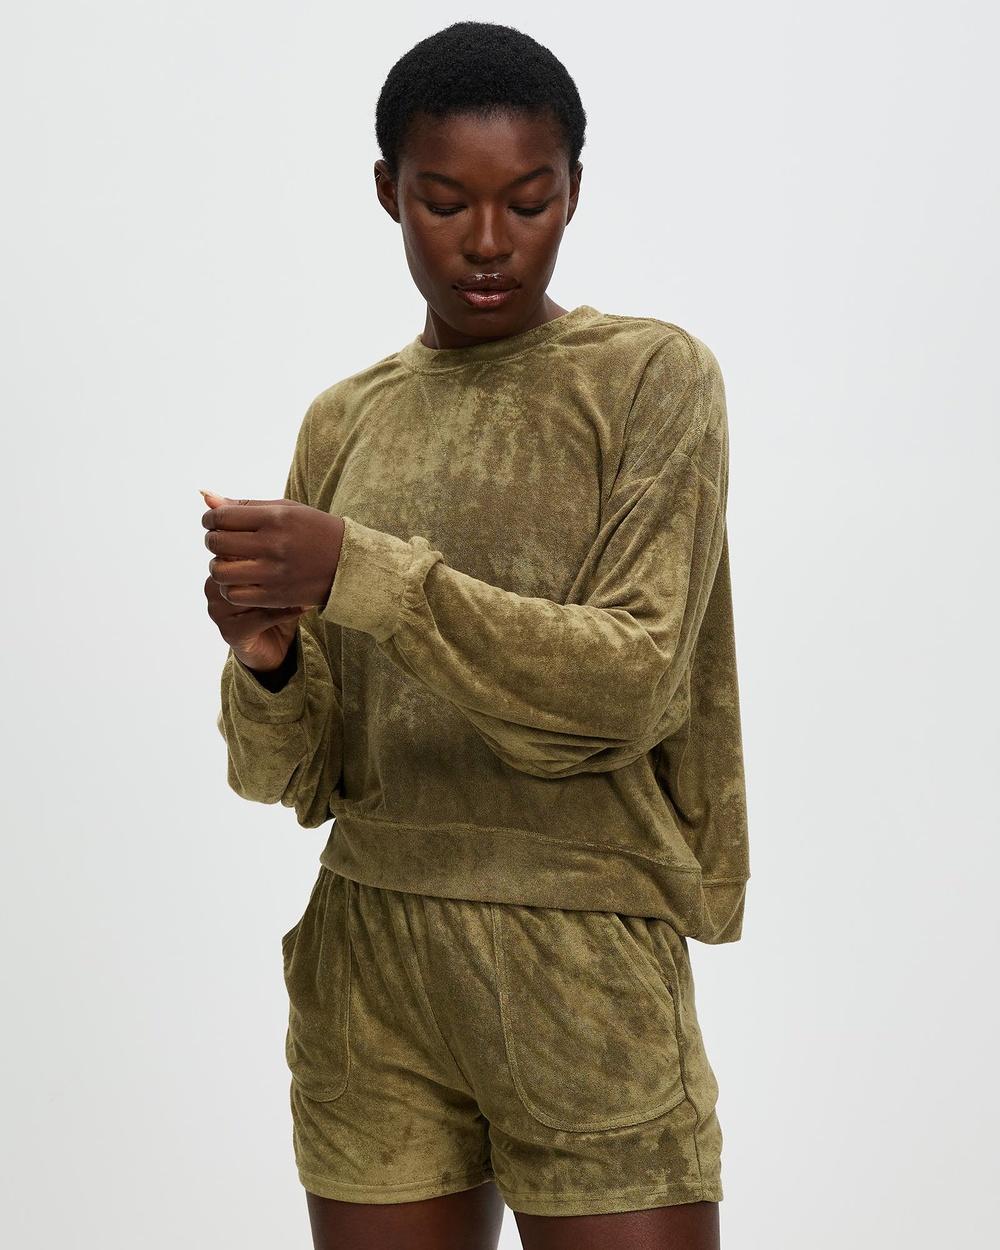 All Fenix Terry Towel Sweater Hoodies Olive